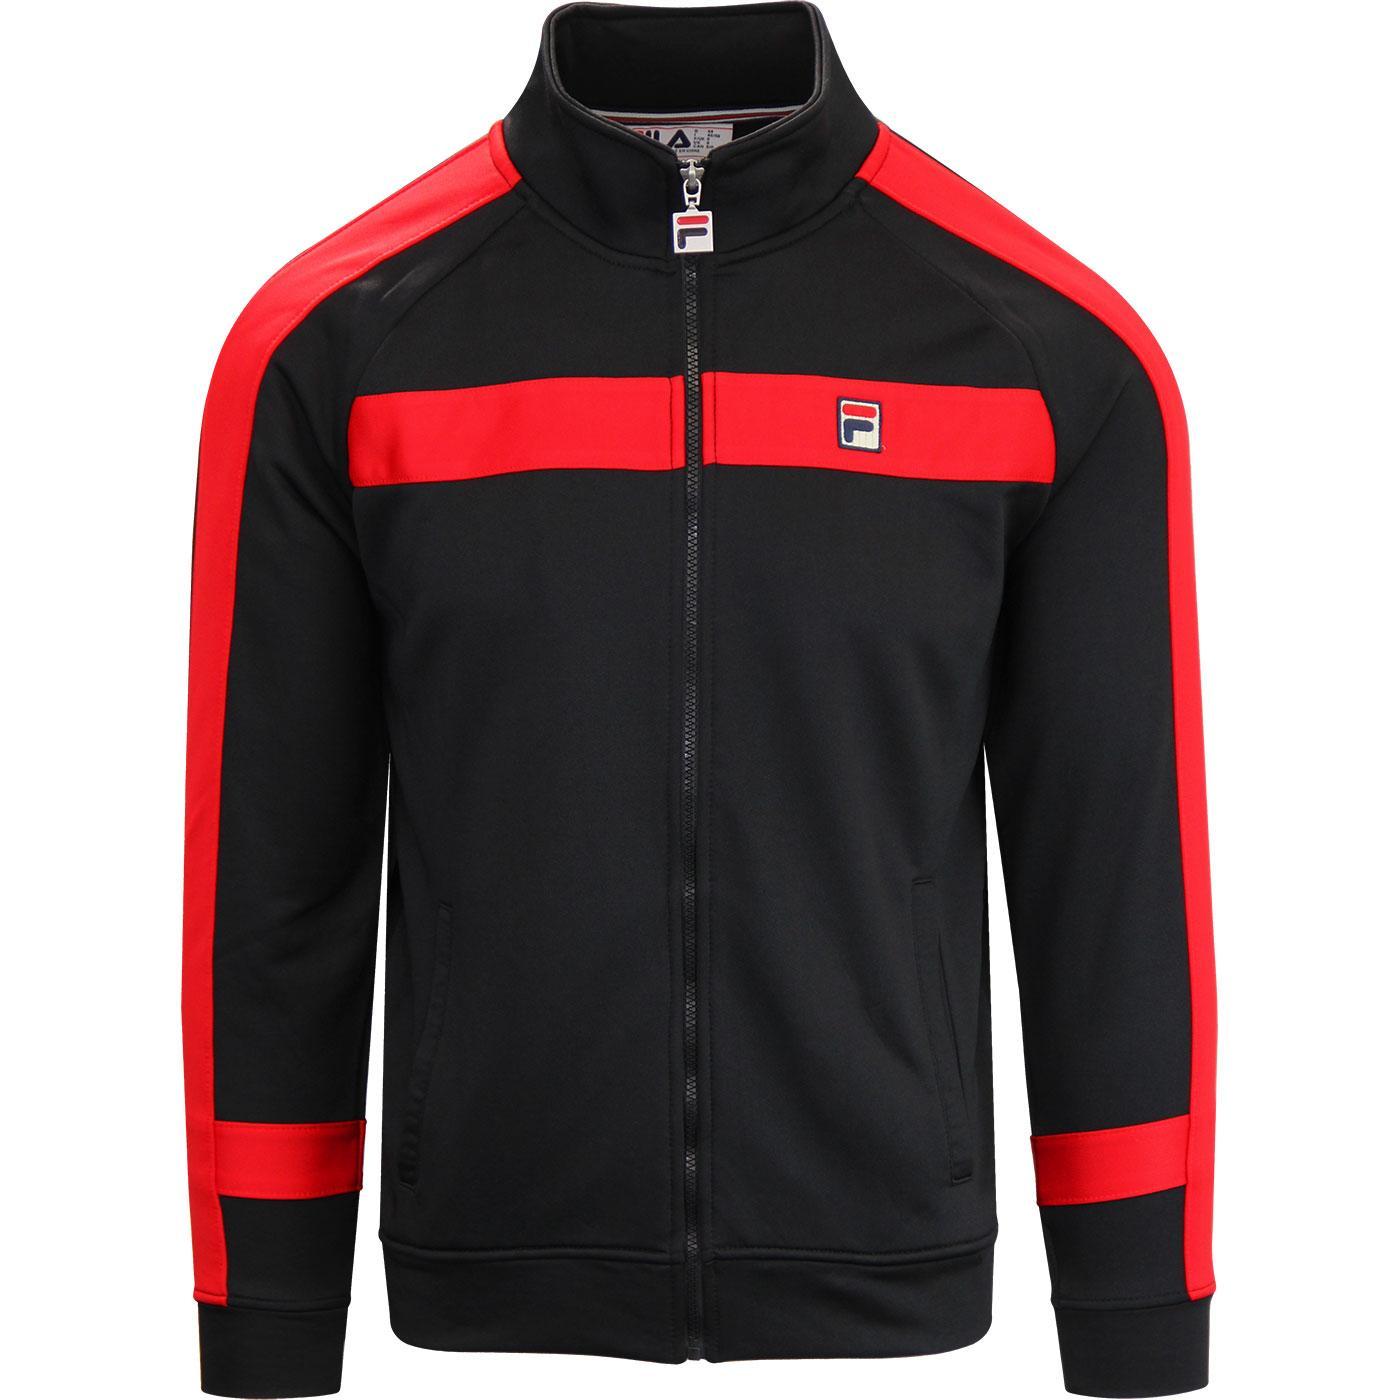 Renzo FILA VINTAGE Panel Track Jacket RED/BLACK